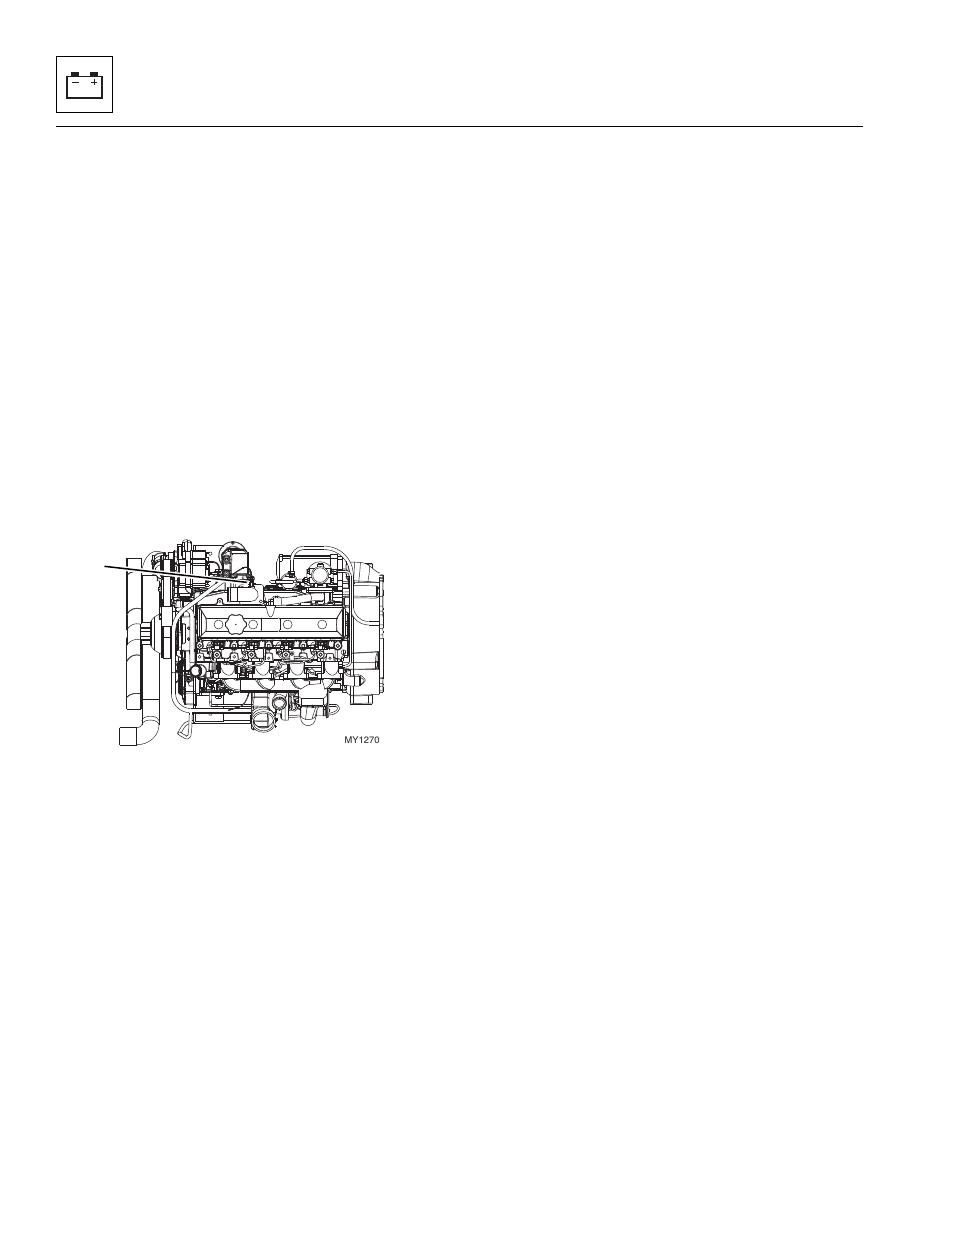 6 Air Manifold Temperature Sensor John Deere 7 Engine Oil Wiring Harness Connectors Pressure Sender Switch Jlg G12 55a Service